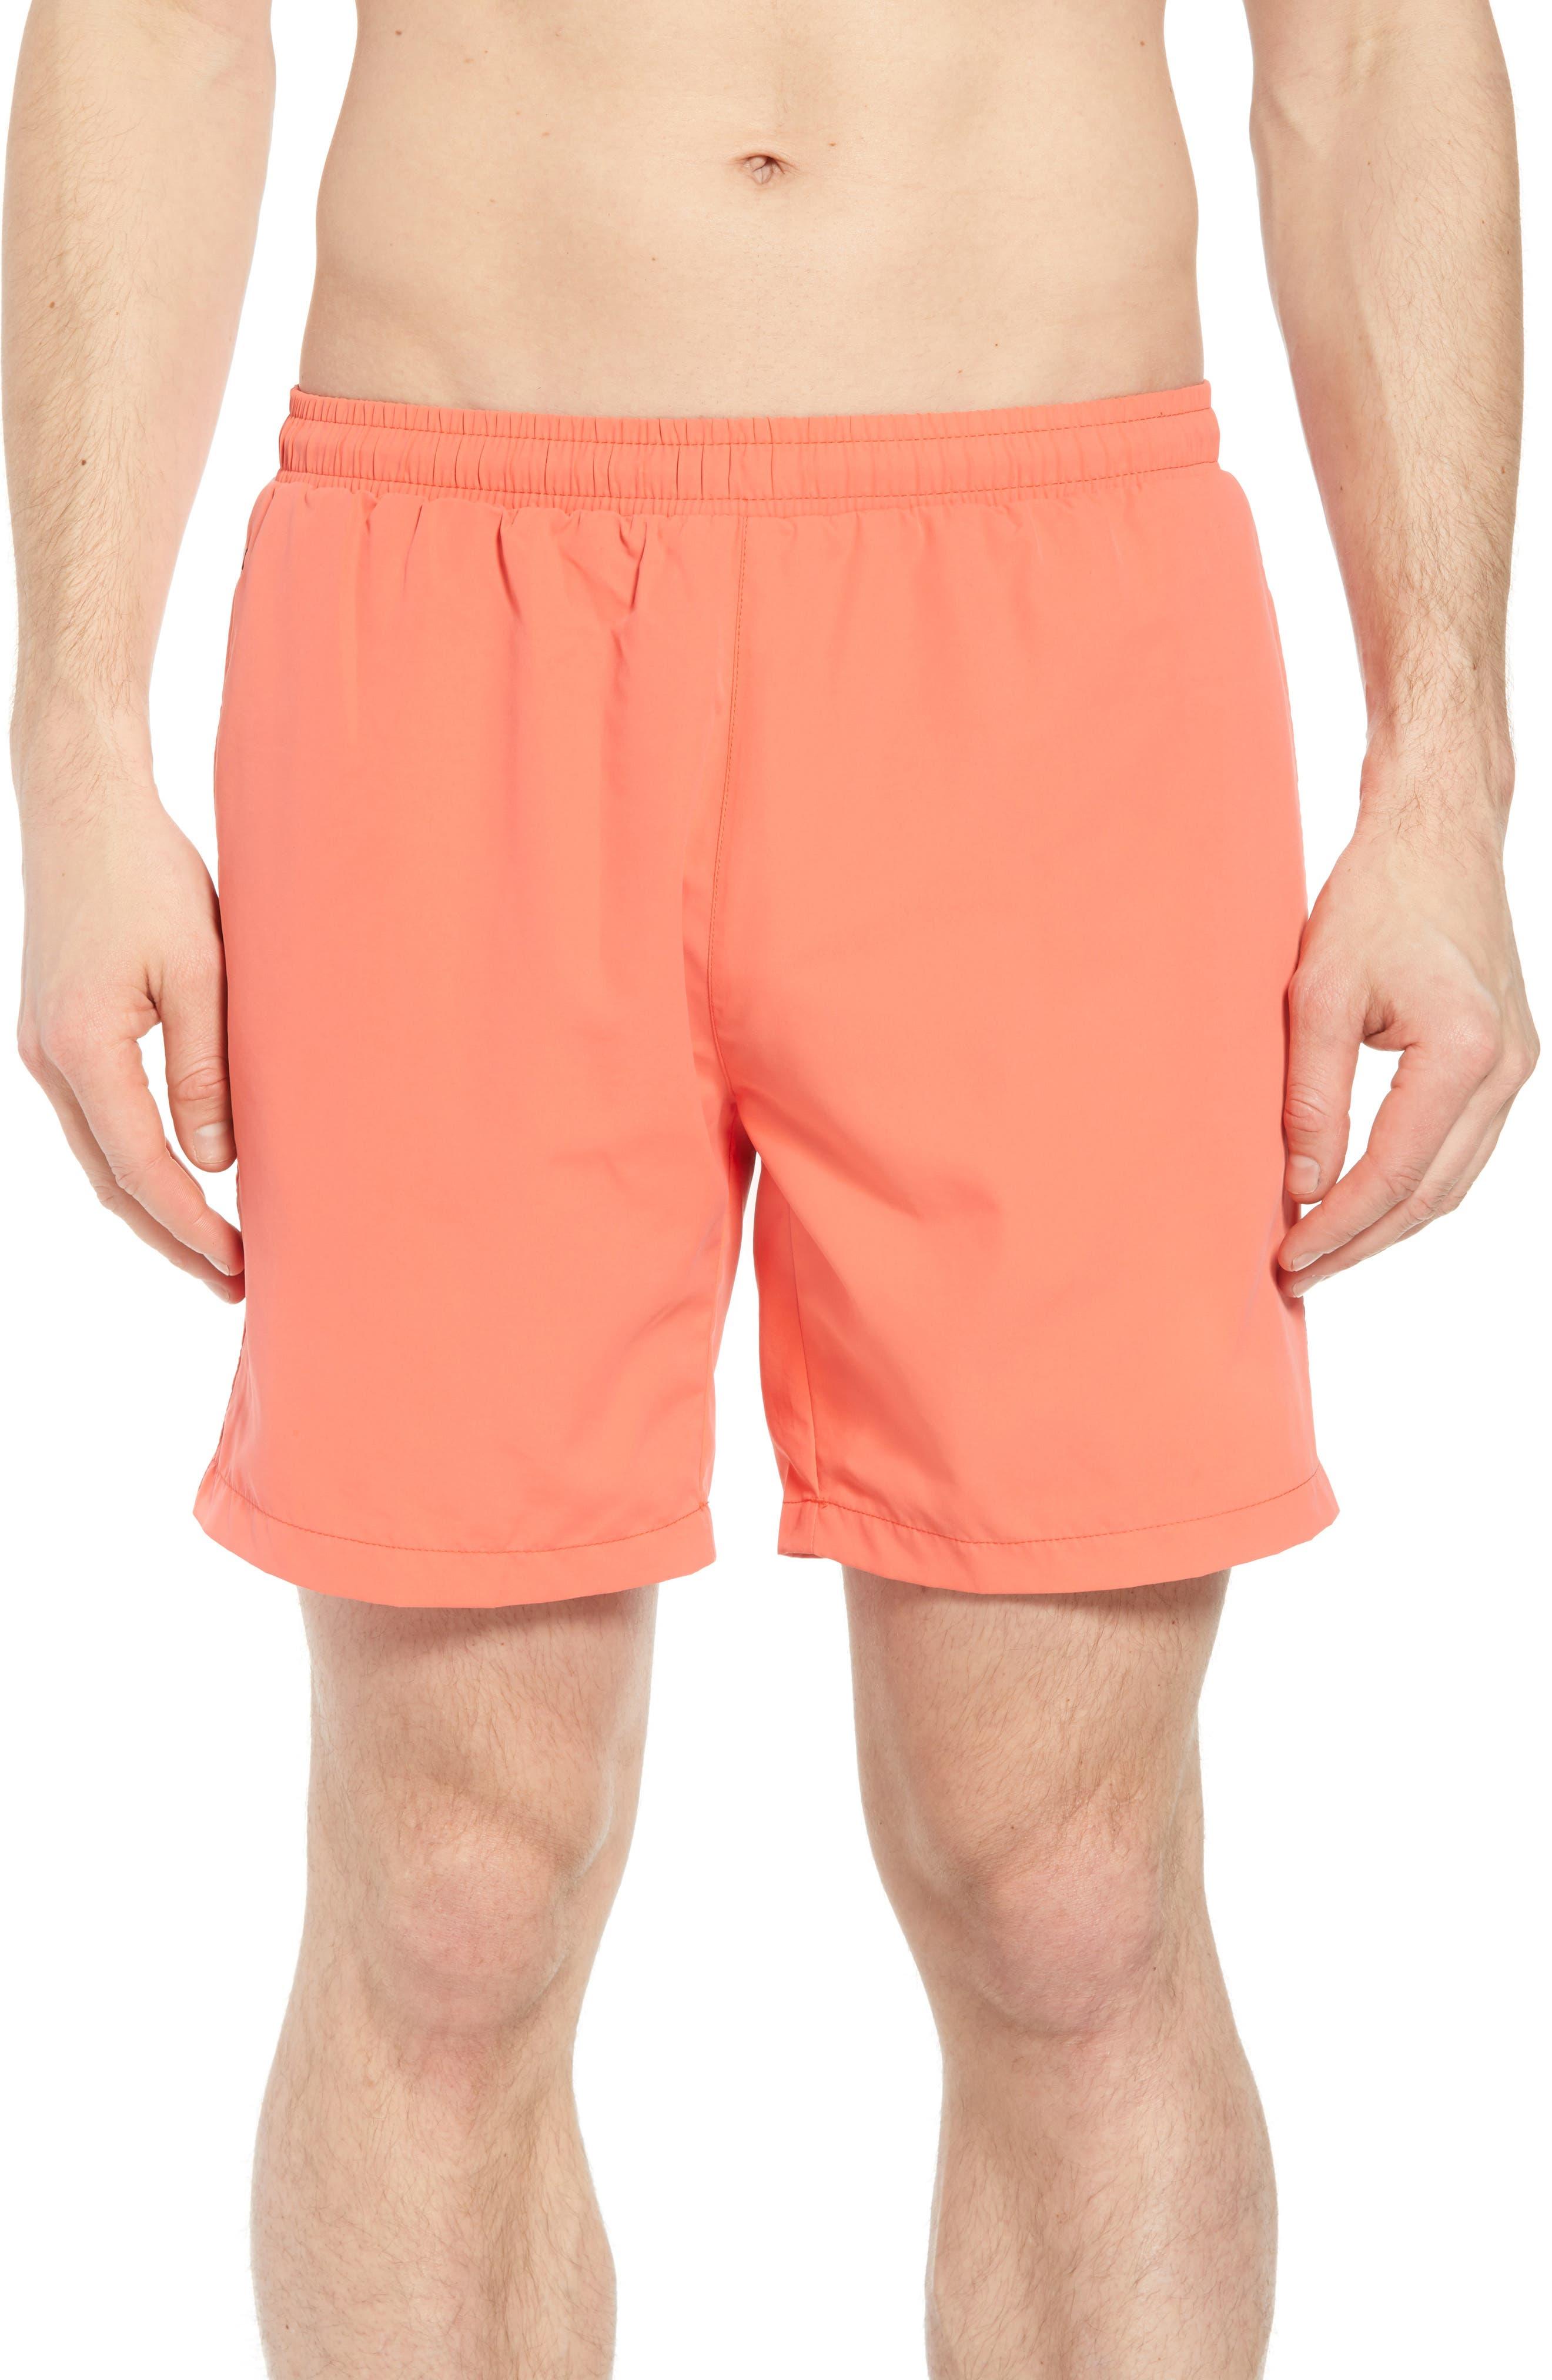 Seabream Regular Fit Stripe Swim Trunks,                         Main,                         color, Pink